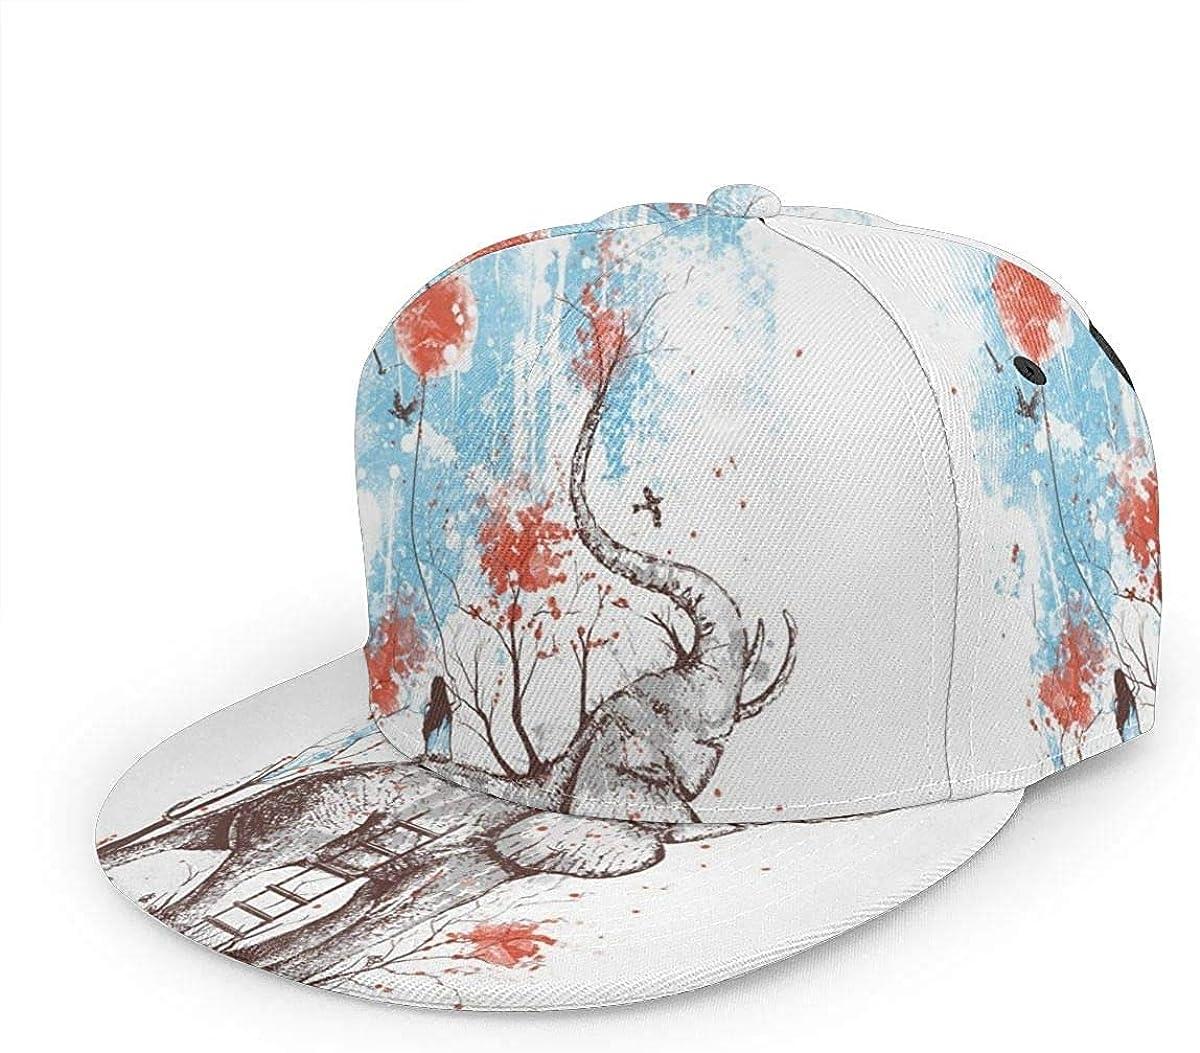 Girl Sit On Elephant Art Design Lightweight Unisex Baseball Caps Adjustable Breathable Sun Hat for Sport Outdoor Black